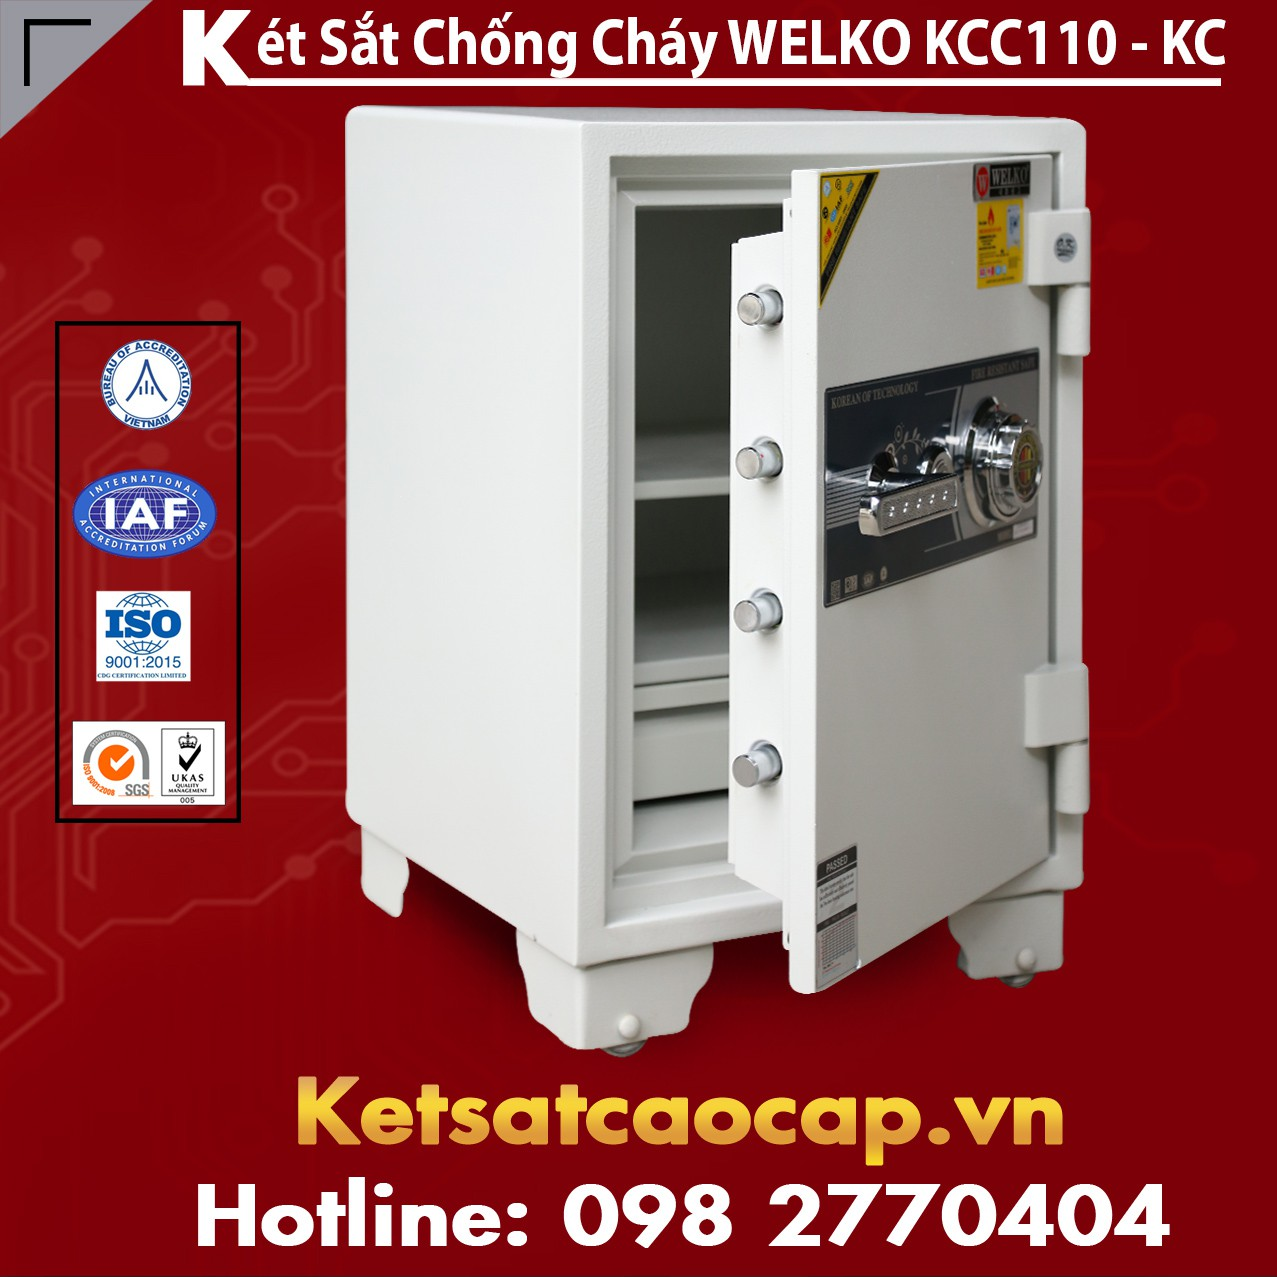 Mua Két Sắt KCC110 White - KC